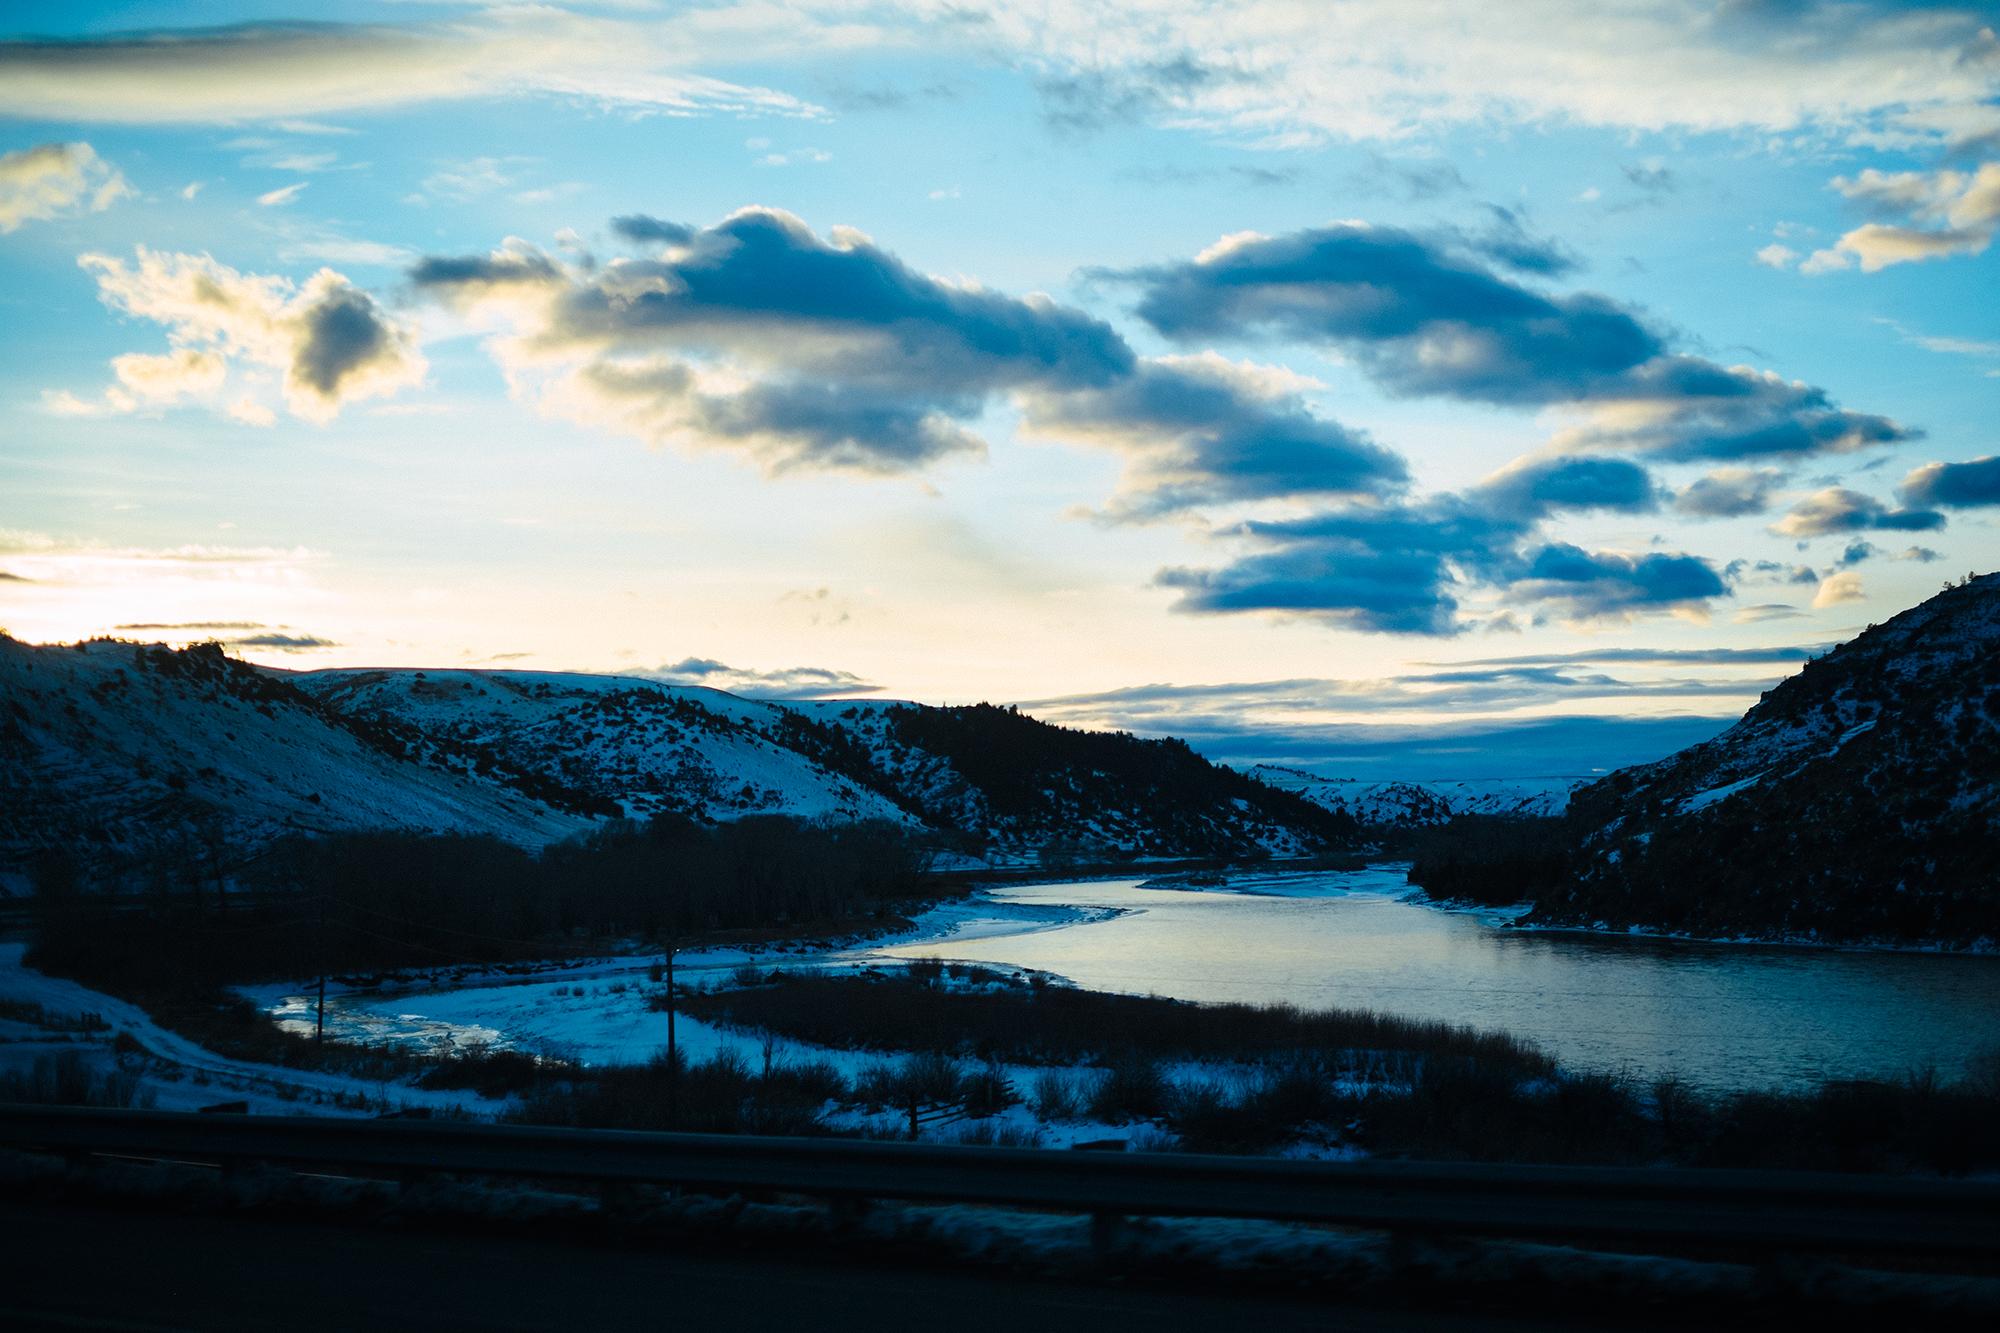 Montana, 2014